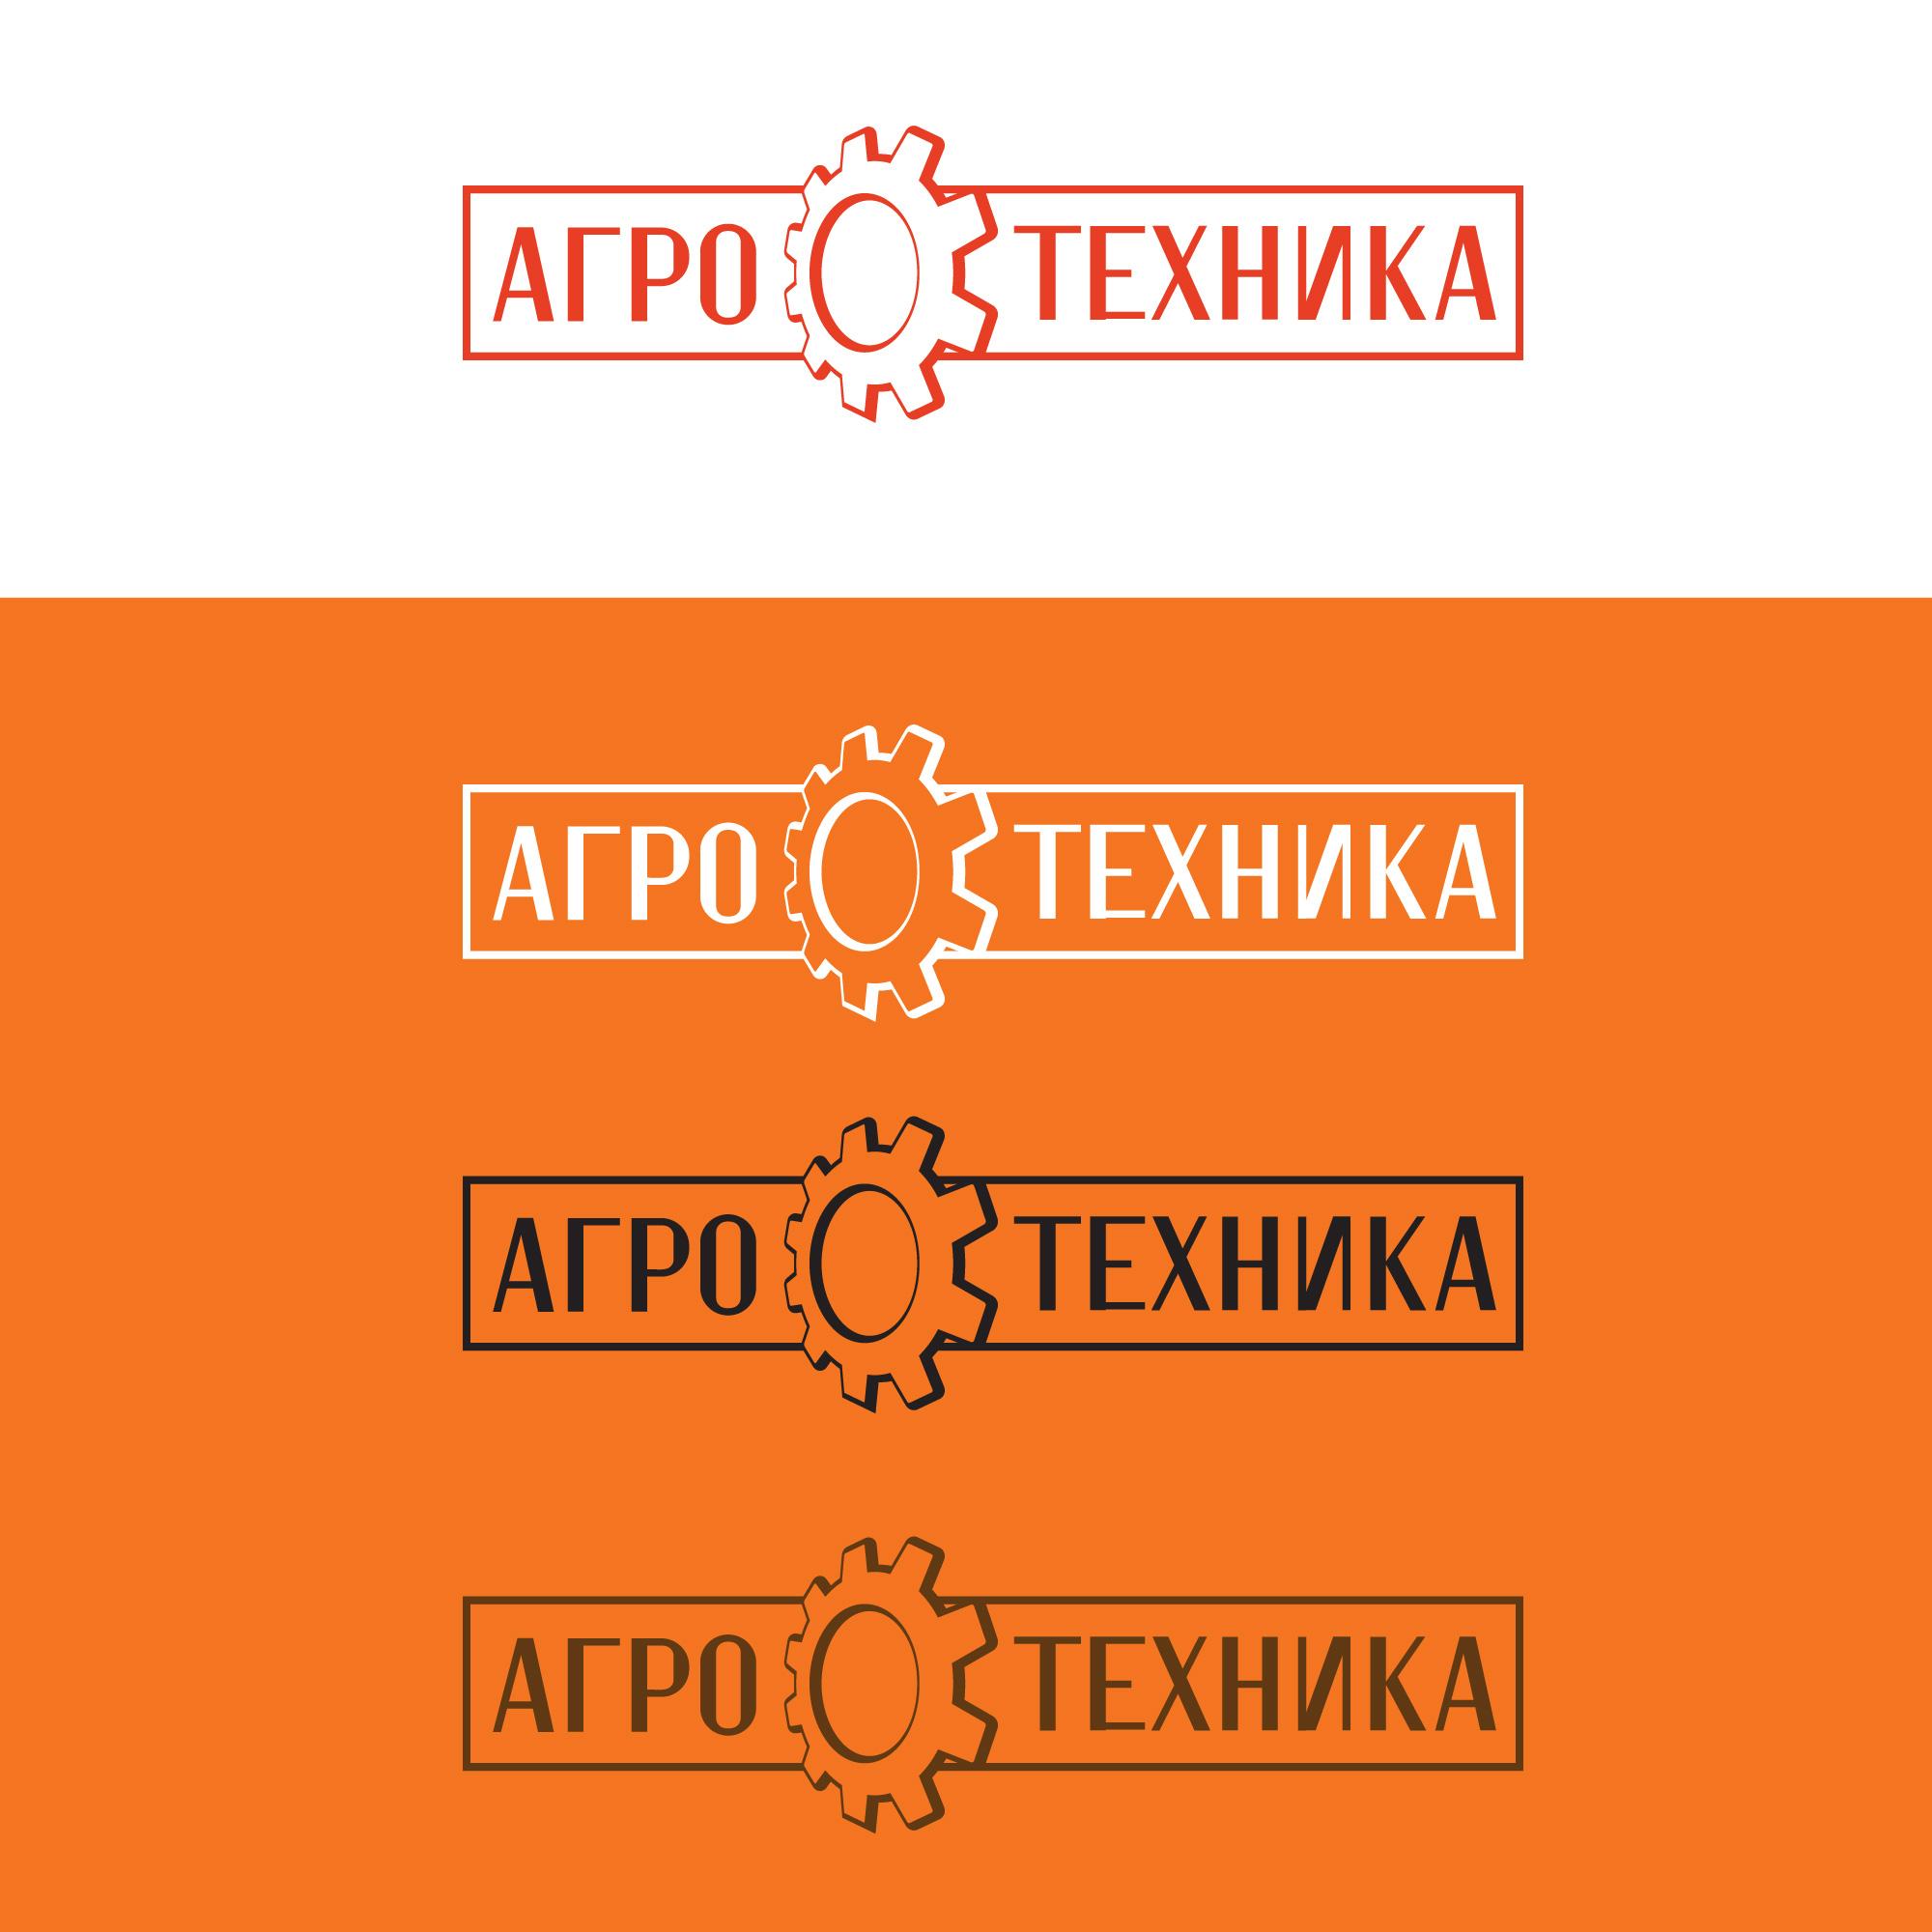 Разработка логотипа для компании Агротехника фото f_9515c056ab542e3c.jpg